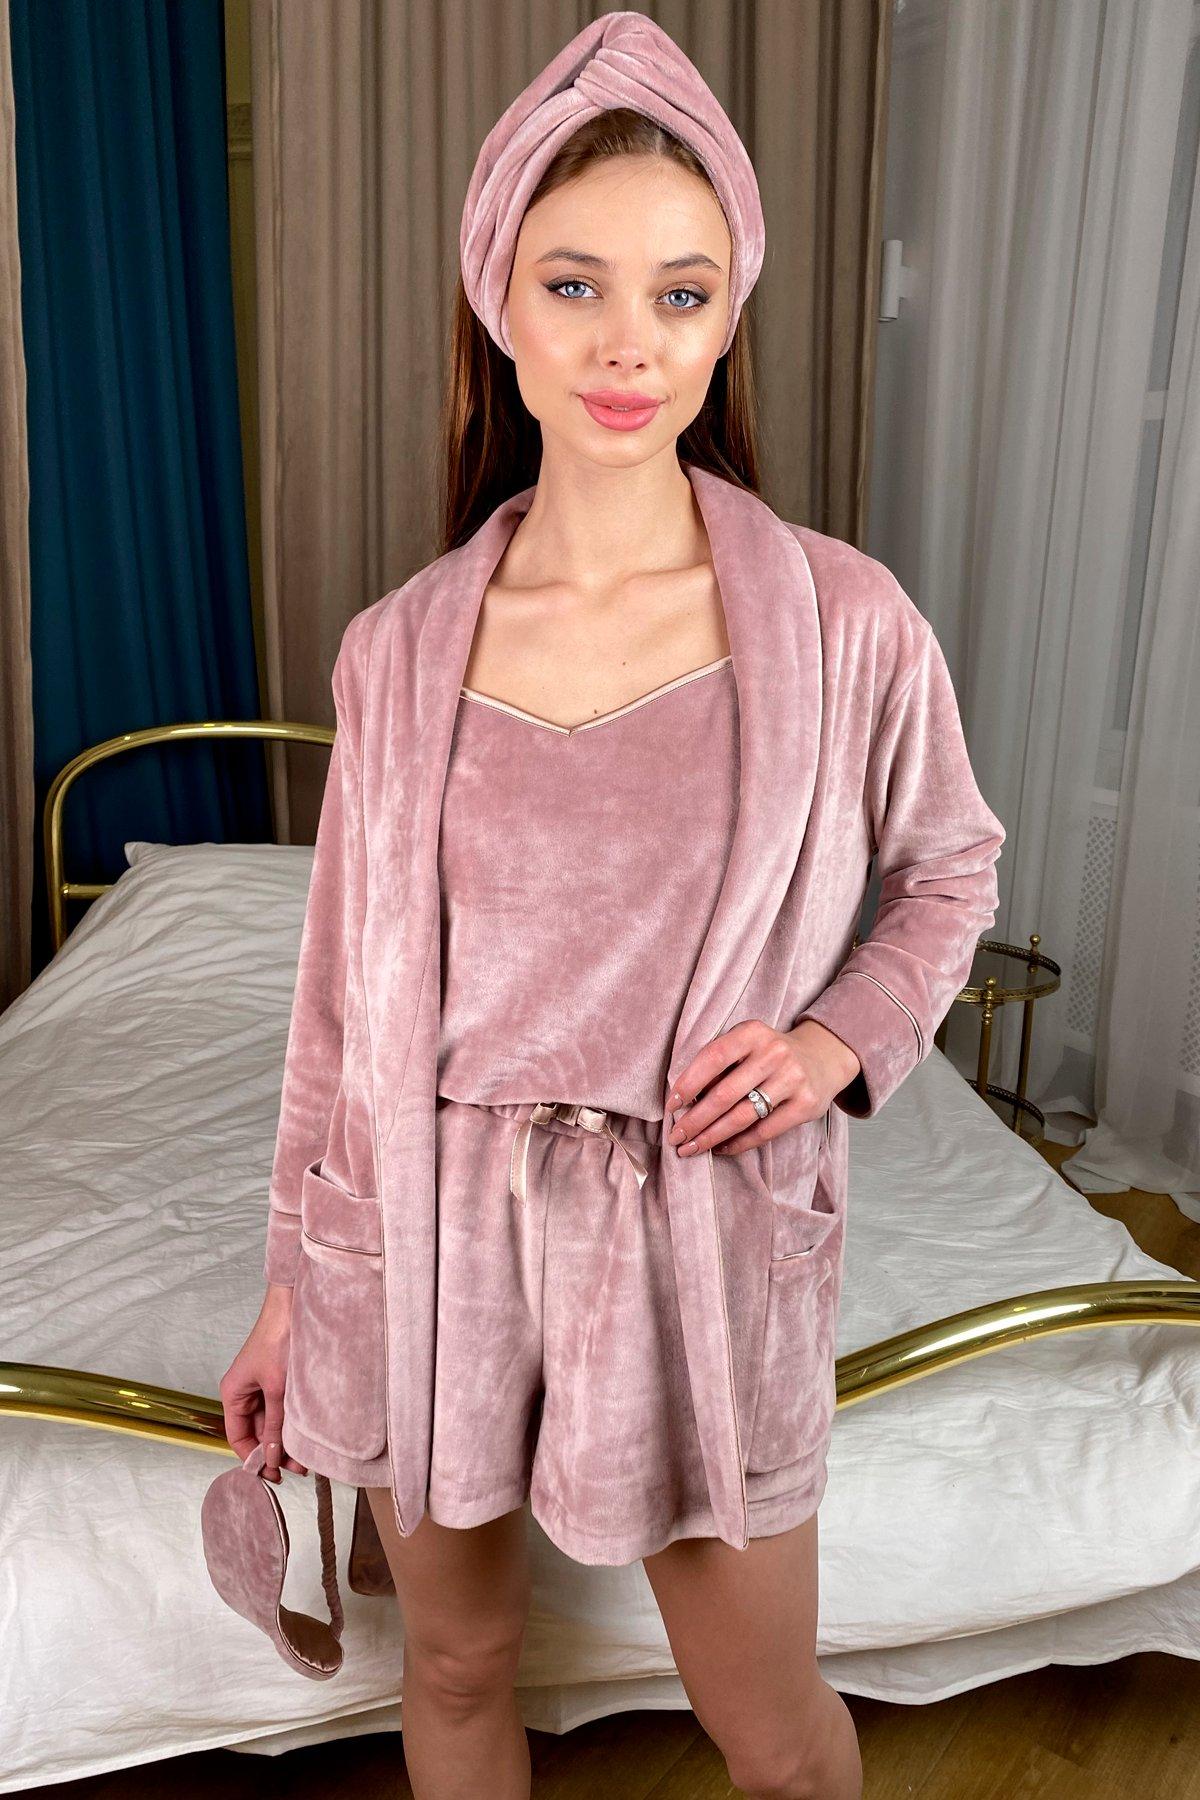 Дримс пижама велюр шорты,майка,маска для сна 10432 АРТ. 46744 Цвет: Пудра/бежевый - фото 3, интернет магазин tm-modus.ru